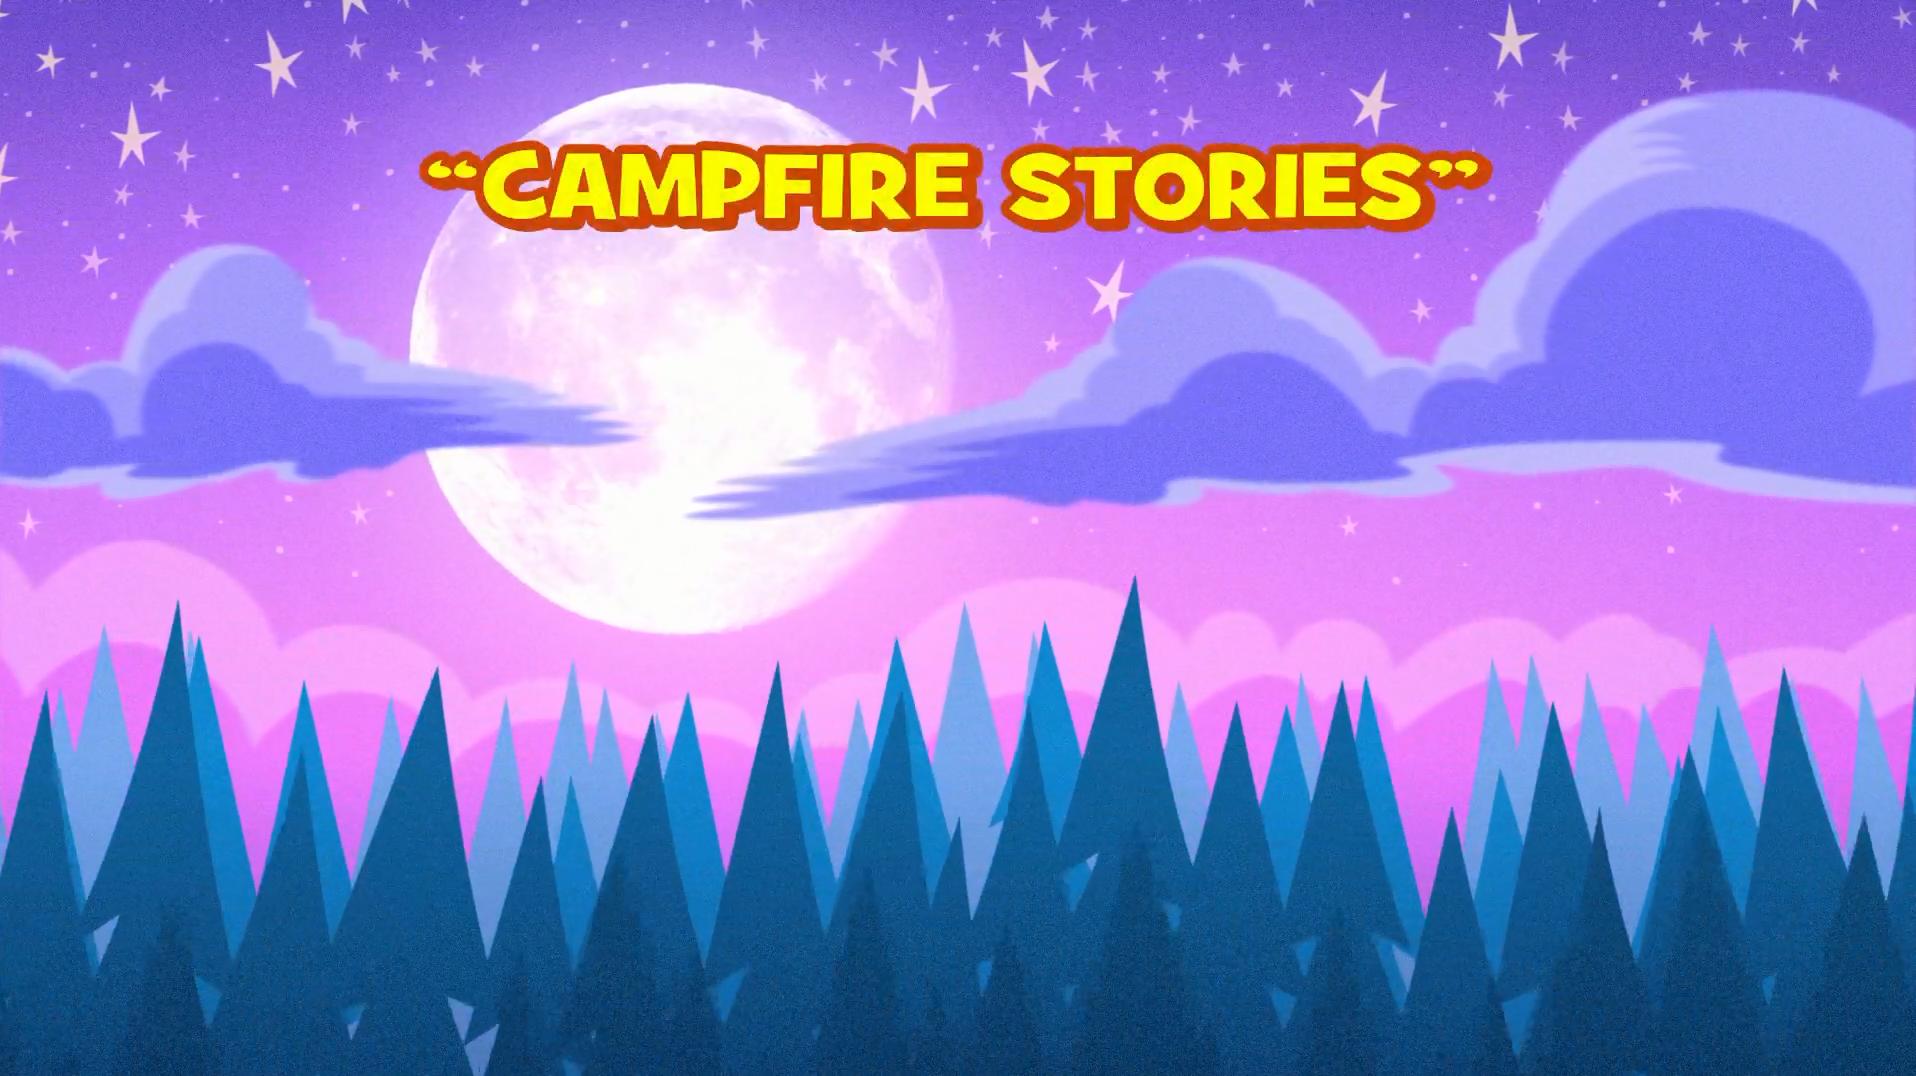 Campfire Stories | Teen Titans Go! Wiki | FANDOM powered by